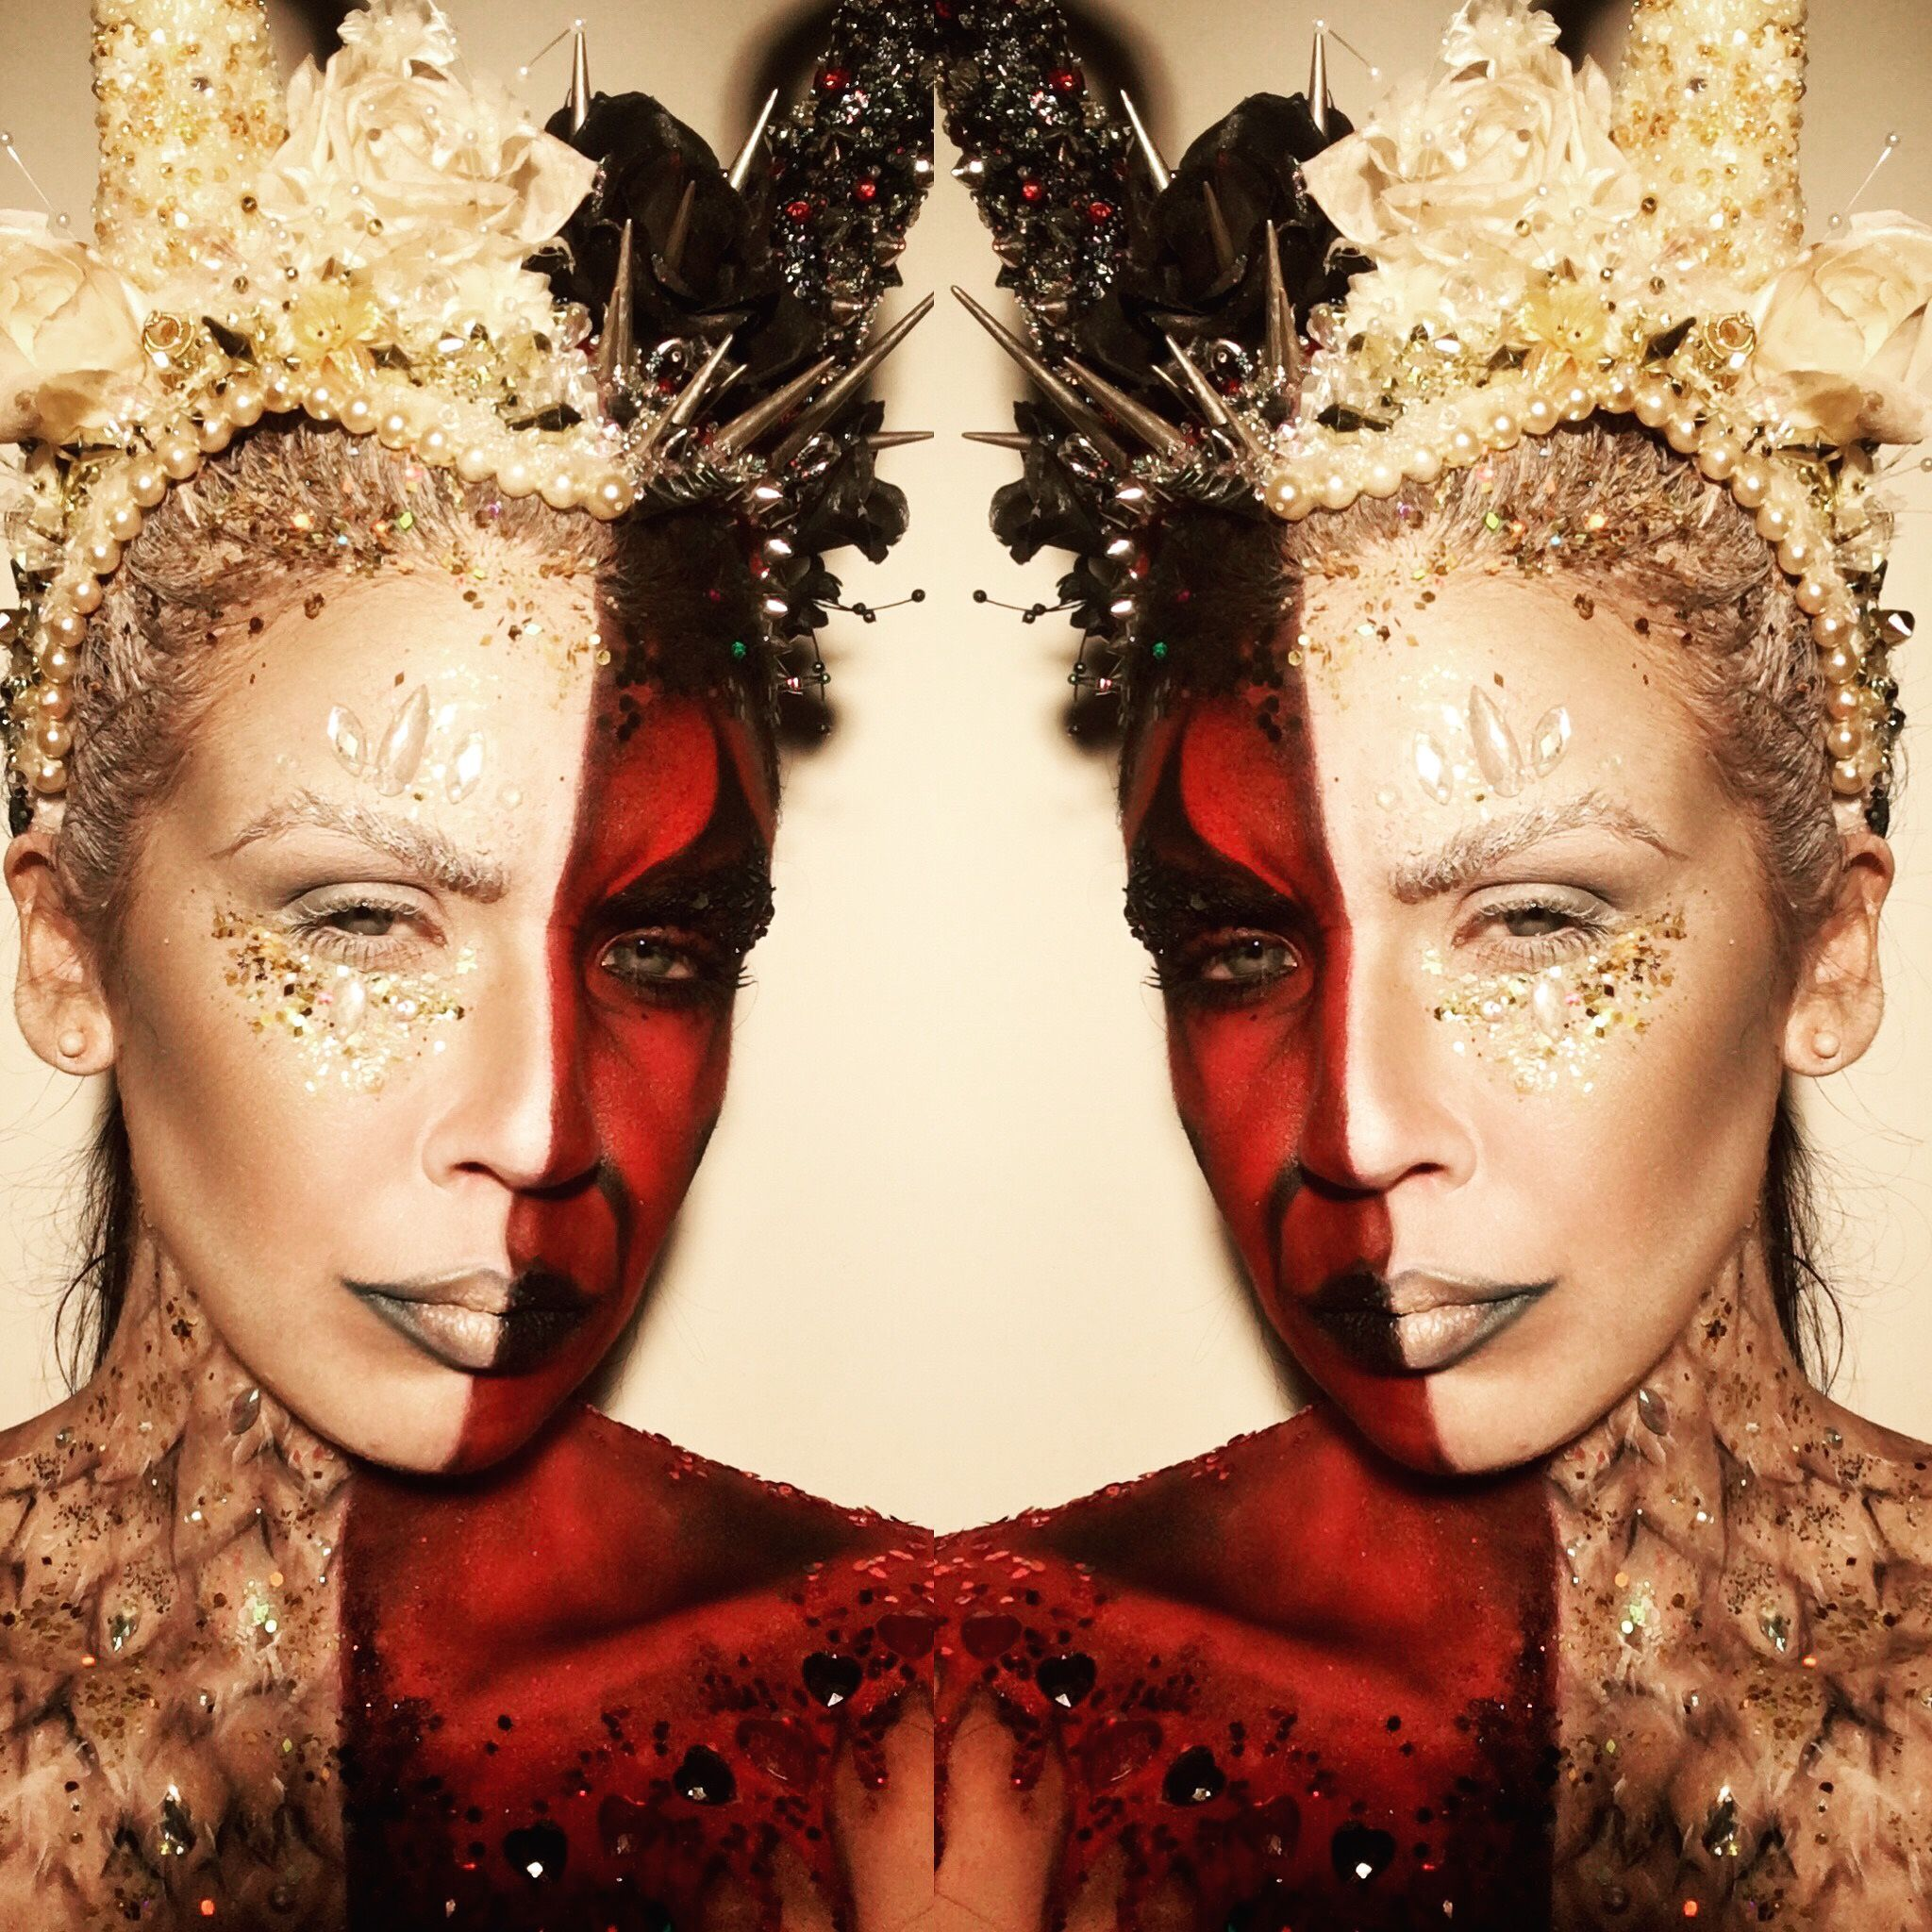 Half angel, half devil makeup, handmade headdress